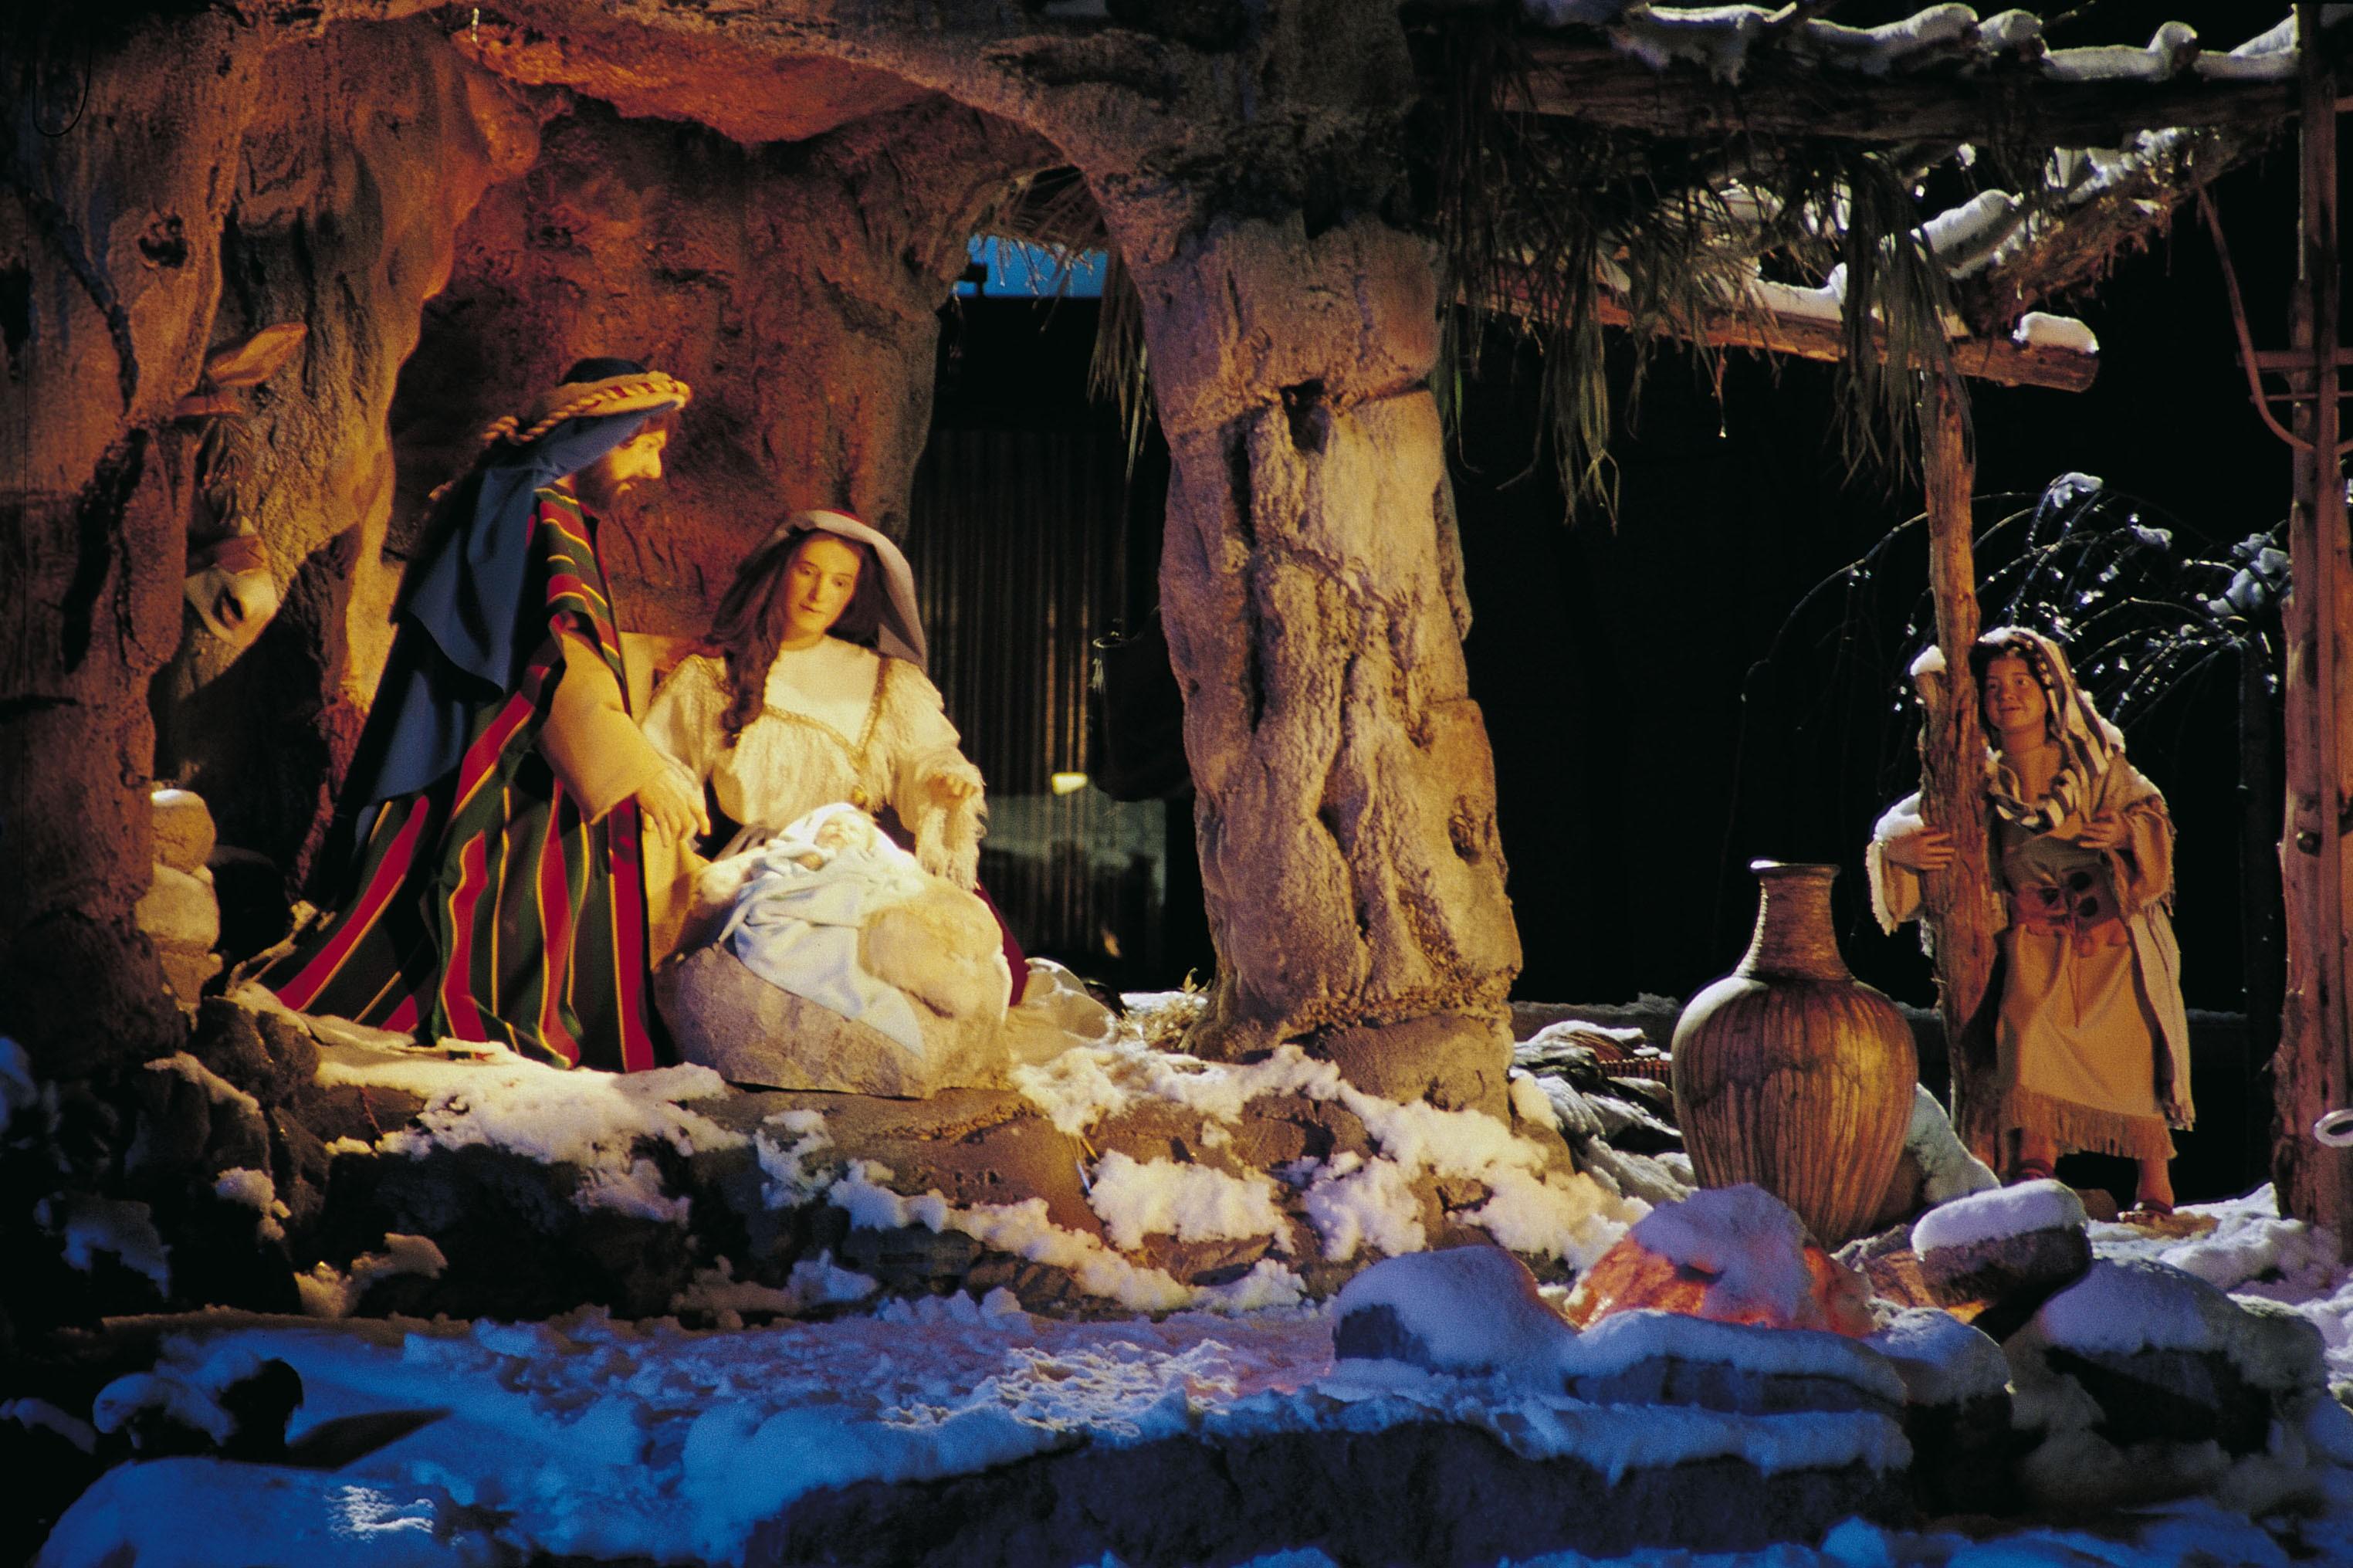 nativity jesus christ lds wallpaper - photo #3